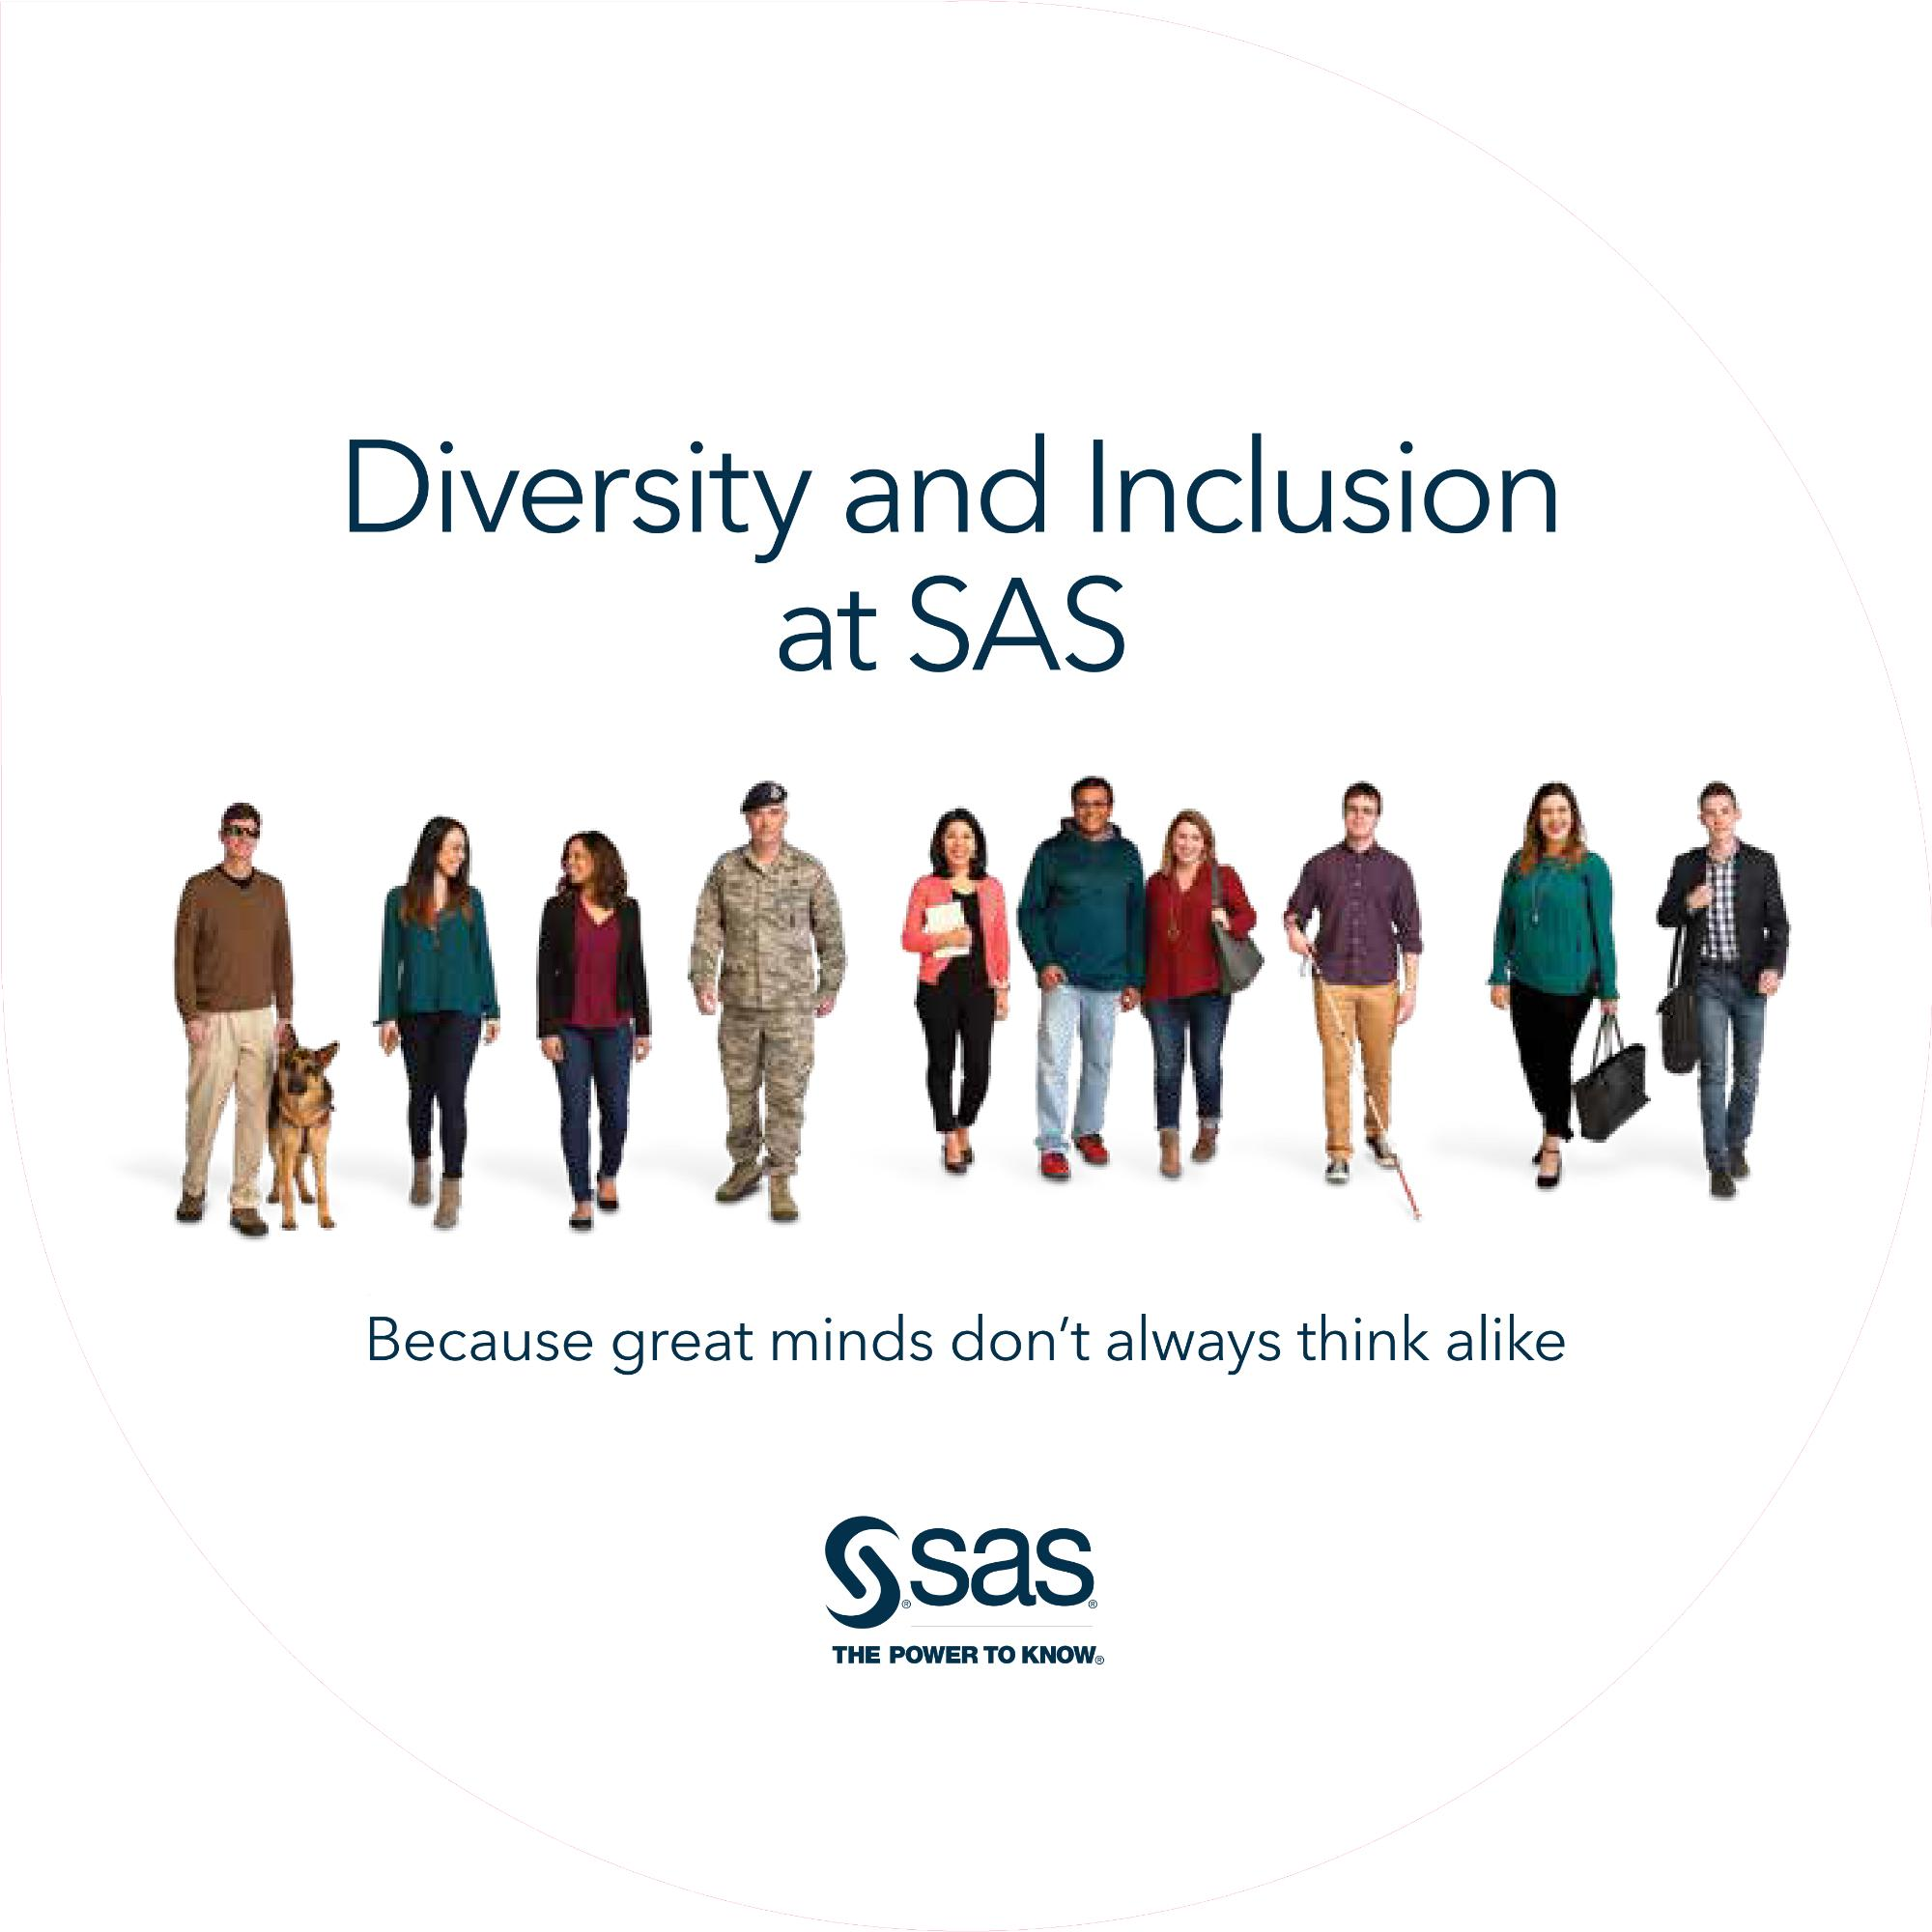 Diversity and Inclusion at SAS